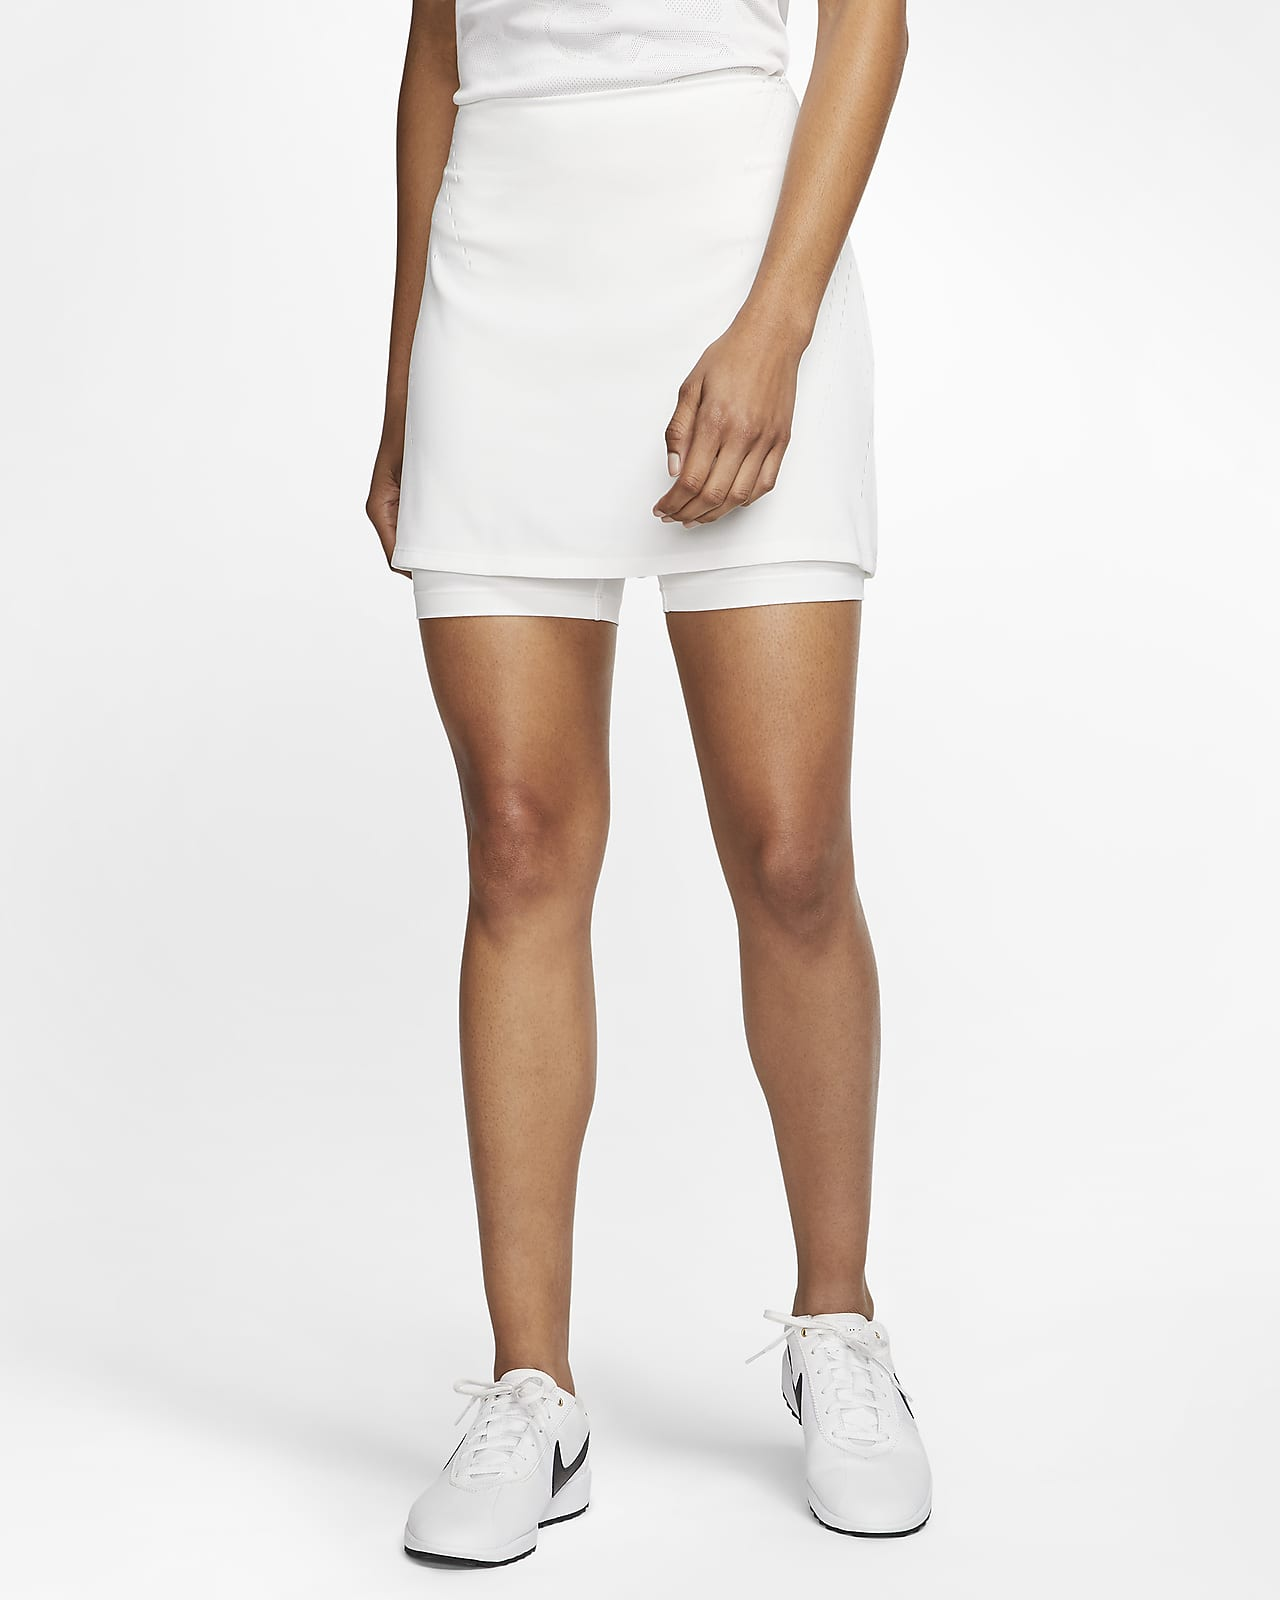 Nike Dri-FIT Ace 38 cm-es női golfszoknya